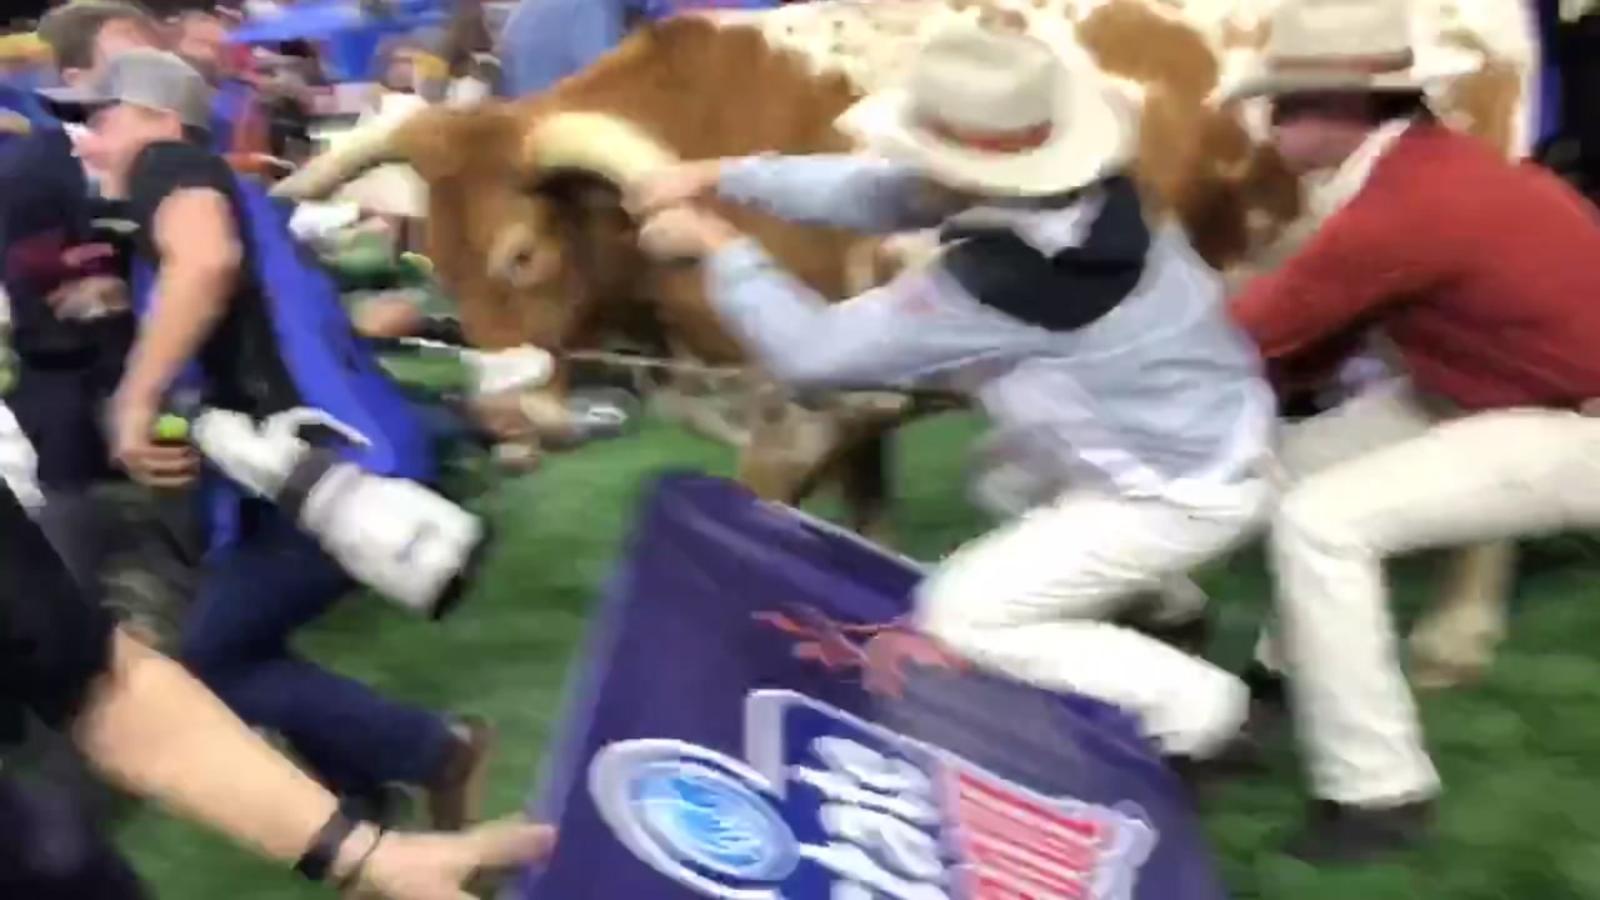 89030b8eb18 Texas Longhorns  mascot Bevo charges at Georgia Bulldogs  mascot Uga ...